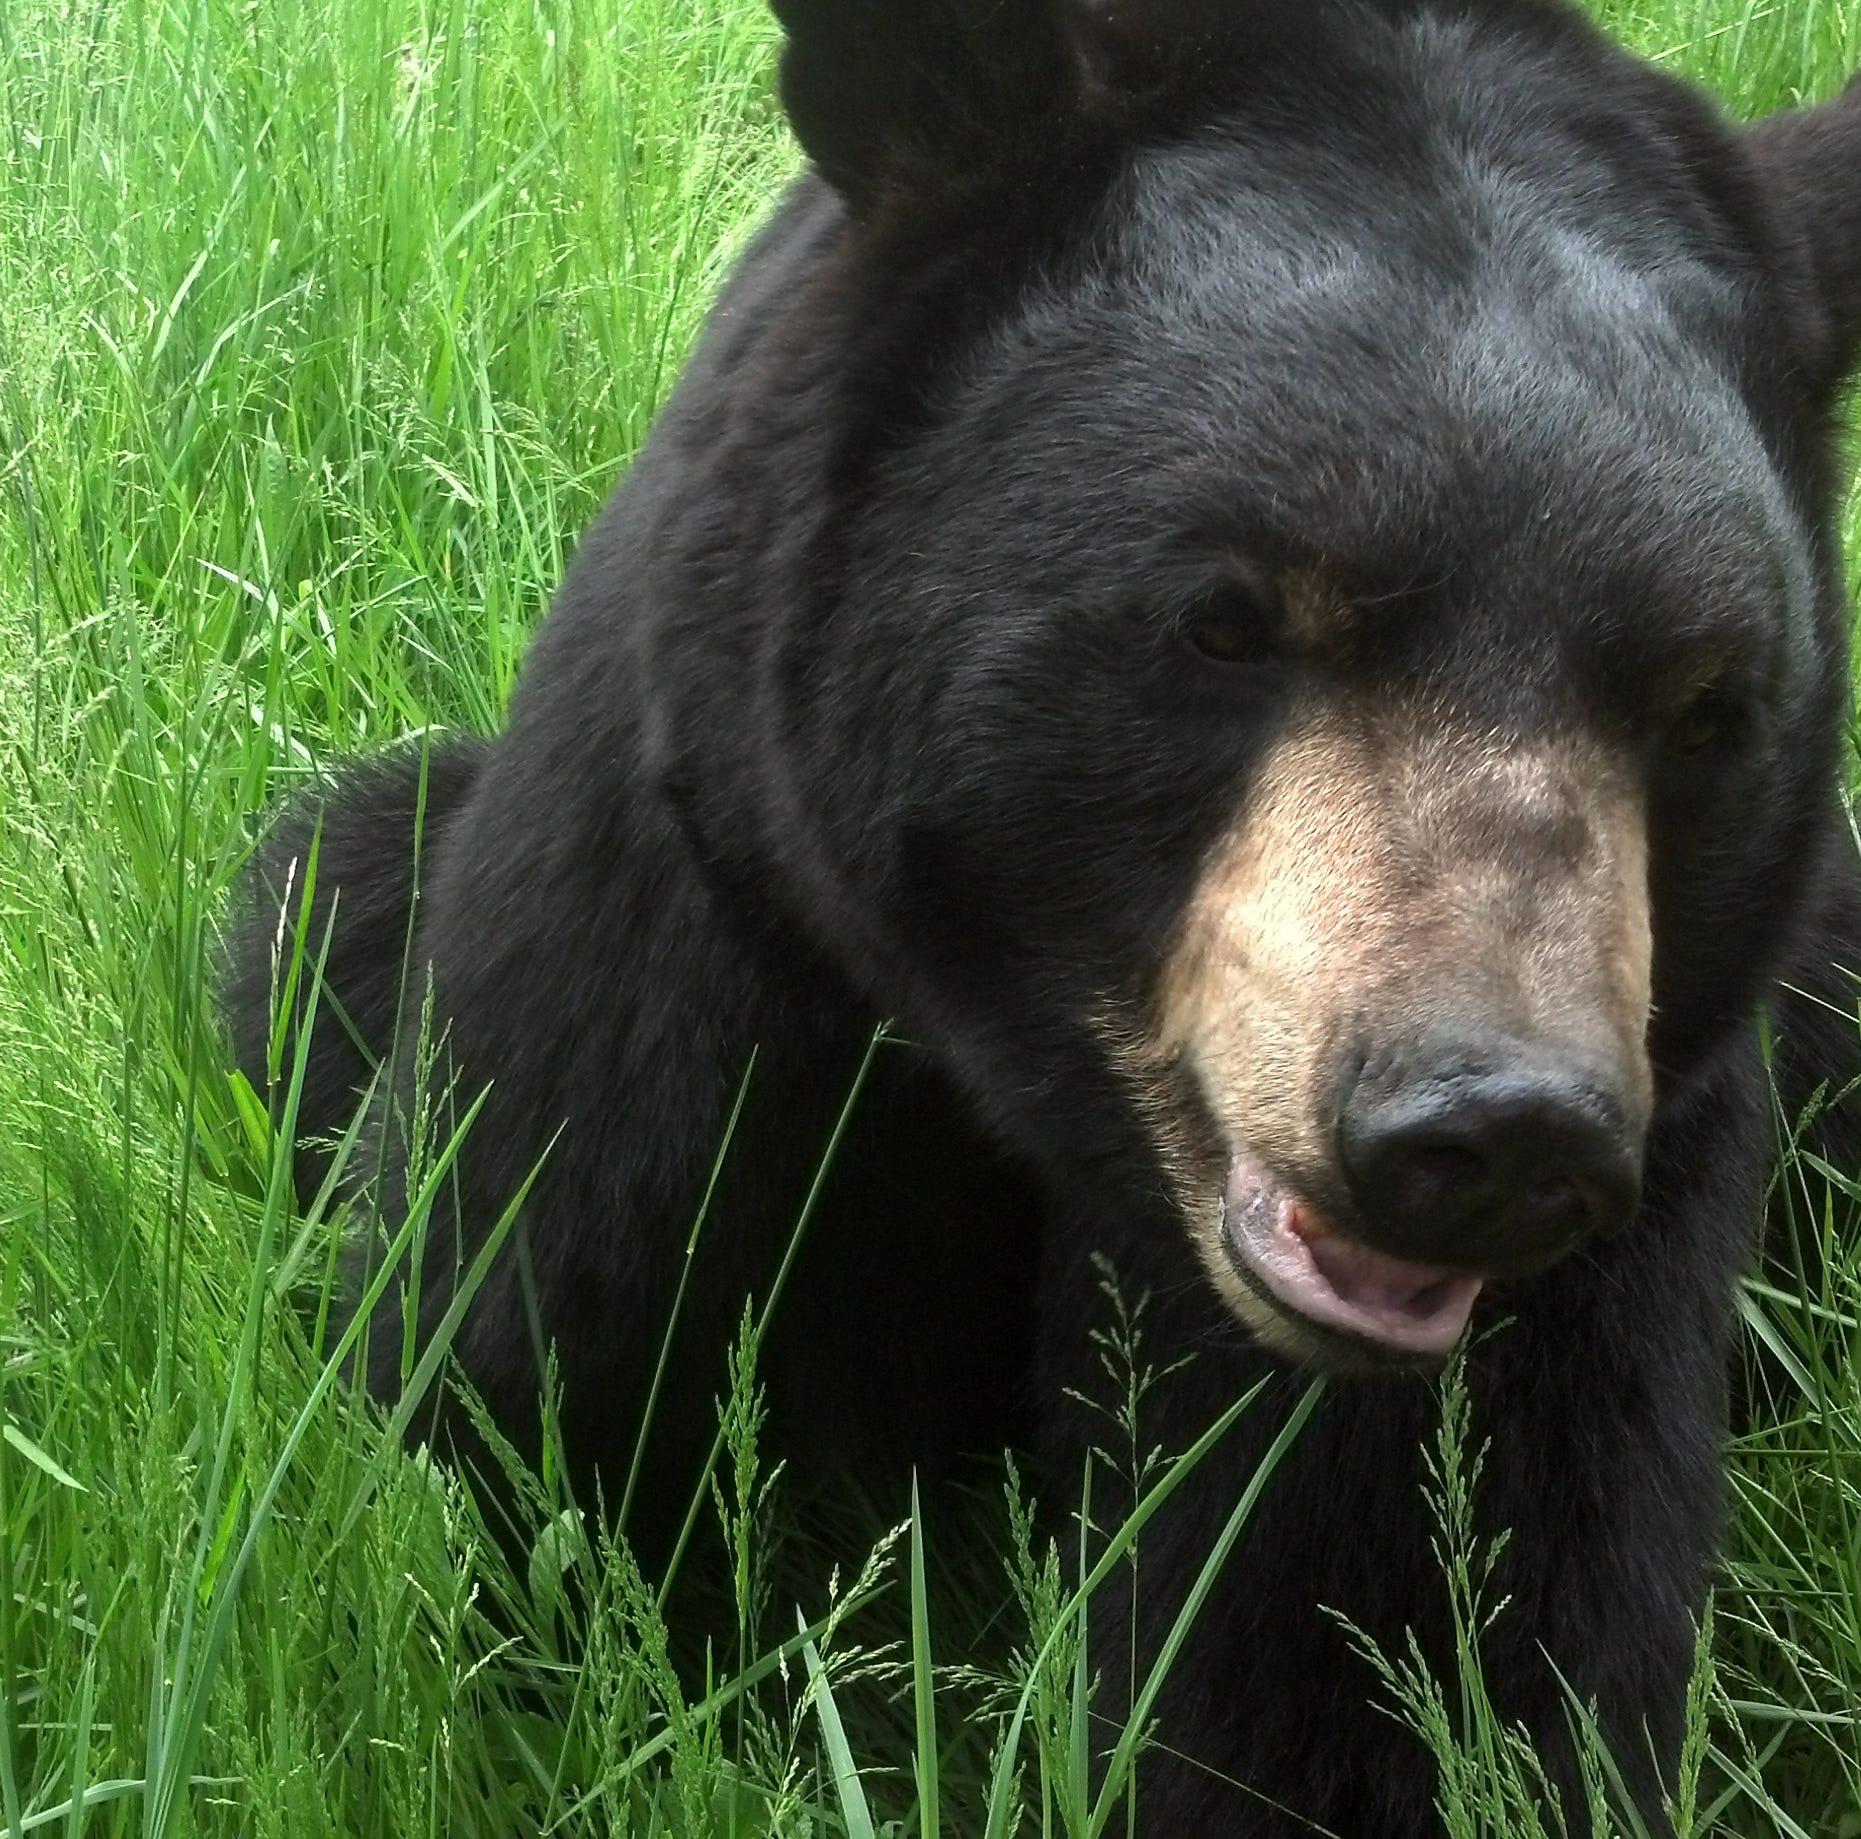 Nature Center Notes: WNC's favorite furry neighbor, the black bear